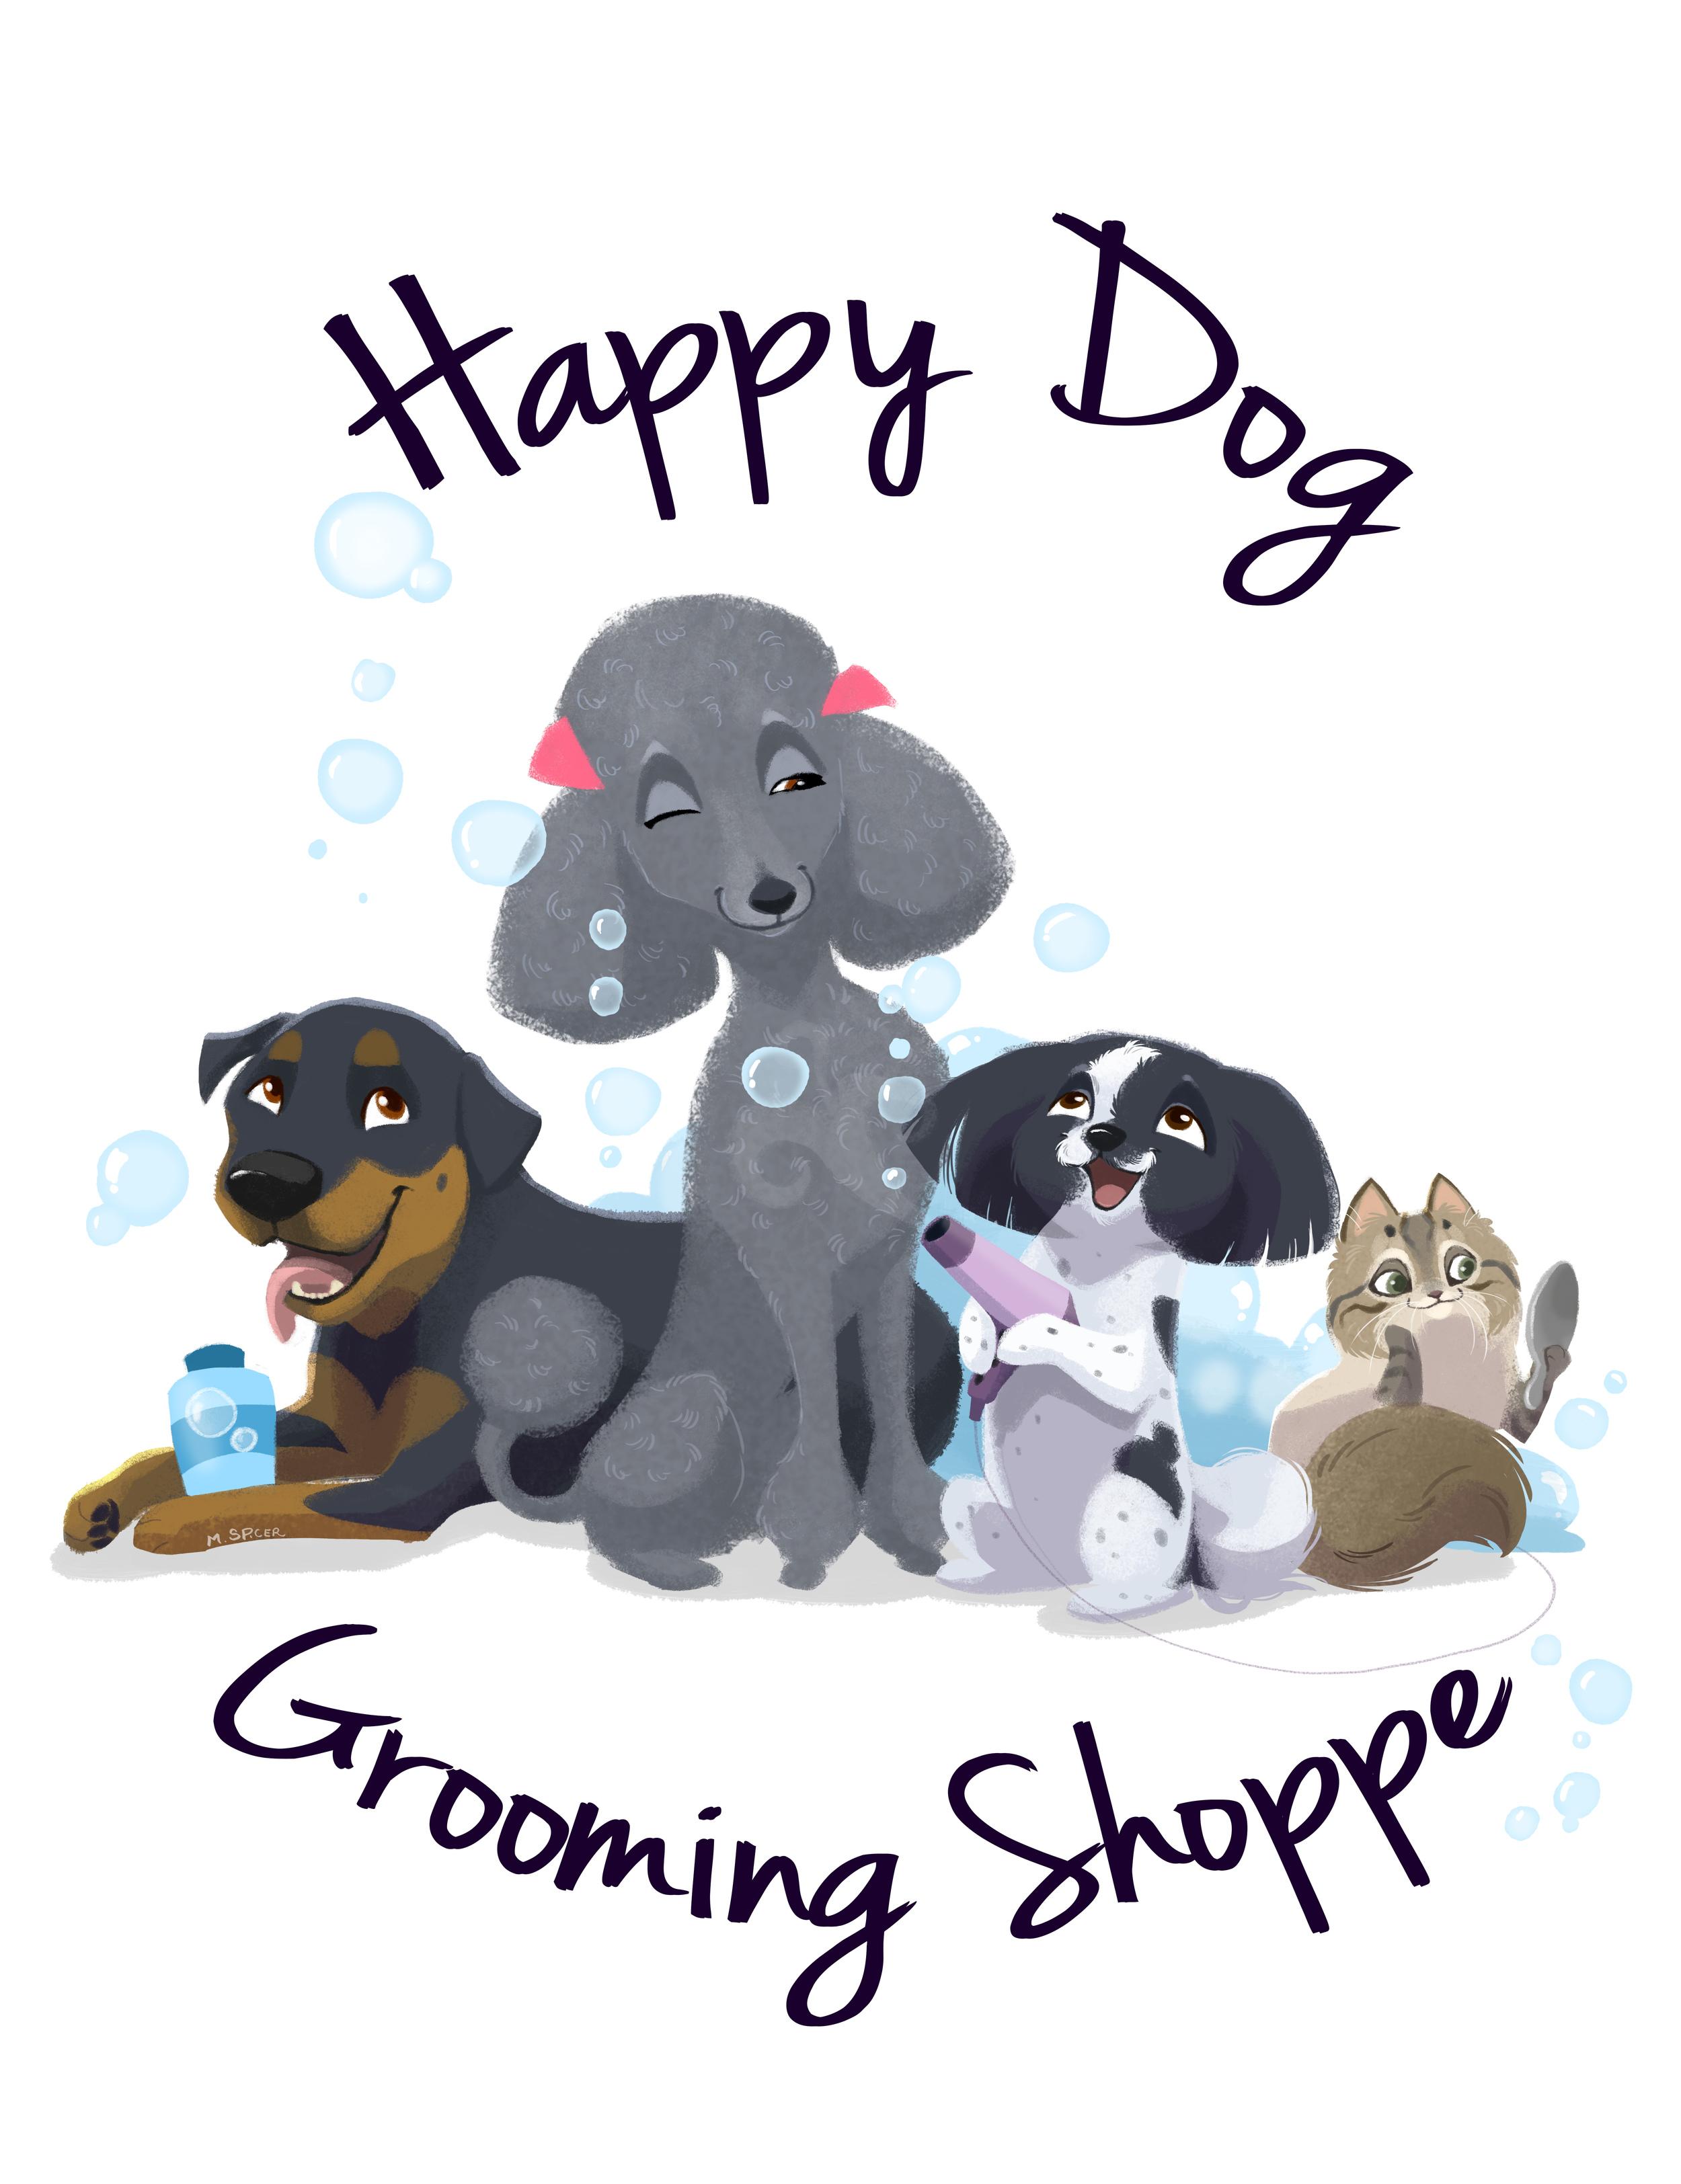 HappyDogGroomingShoppeLogo2.jpg